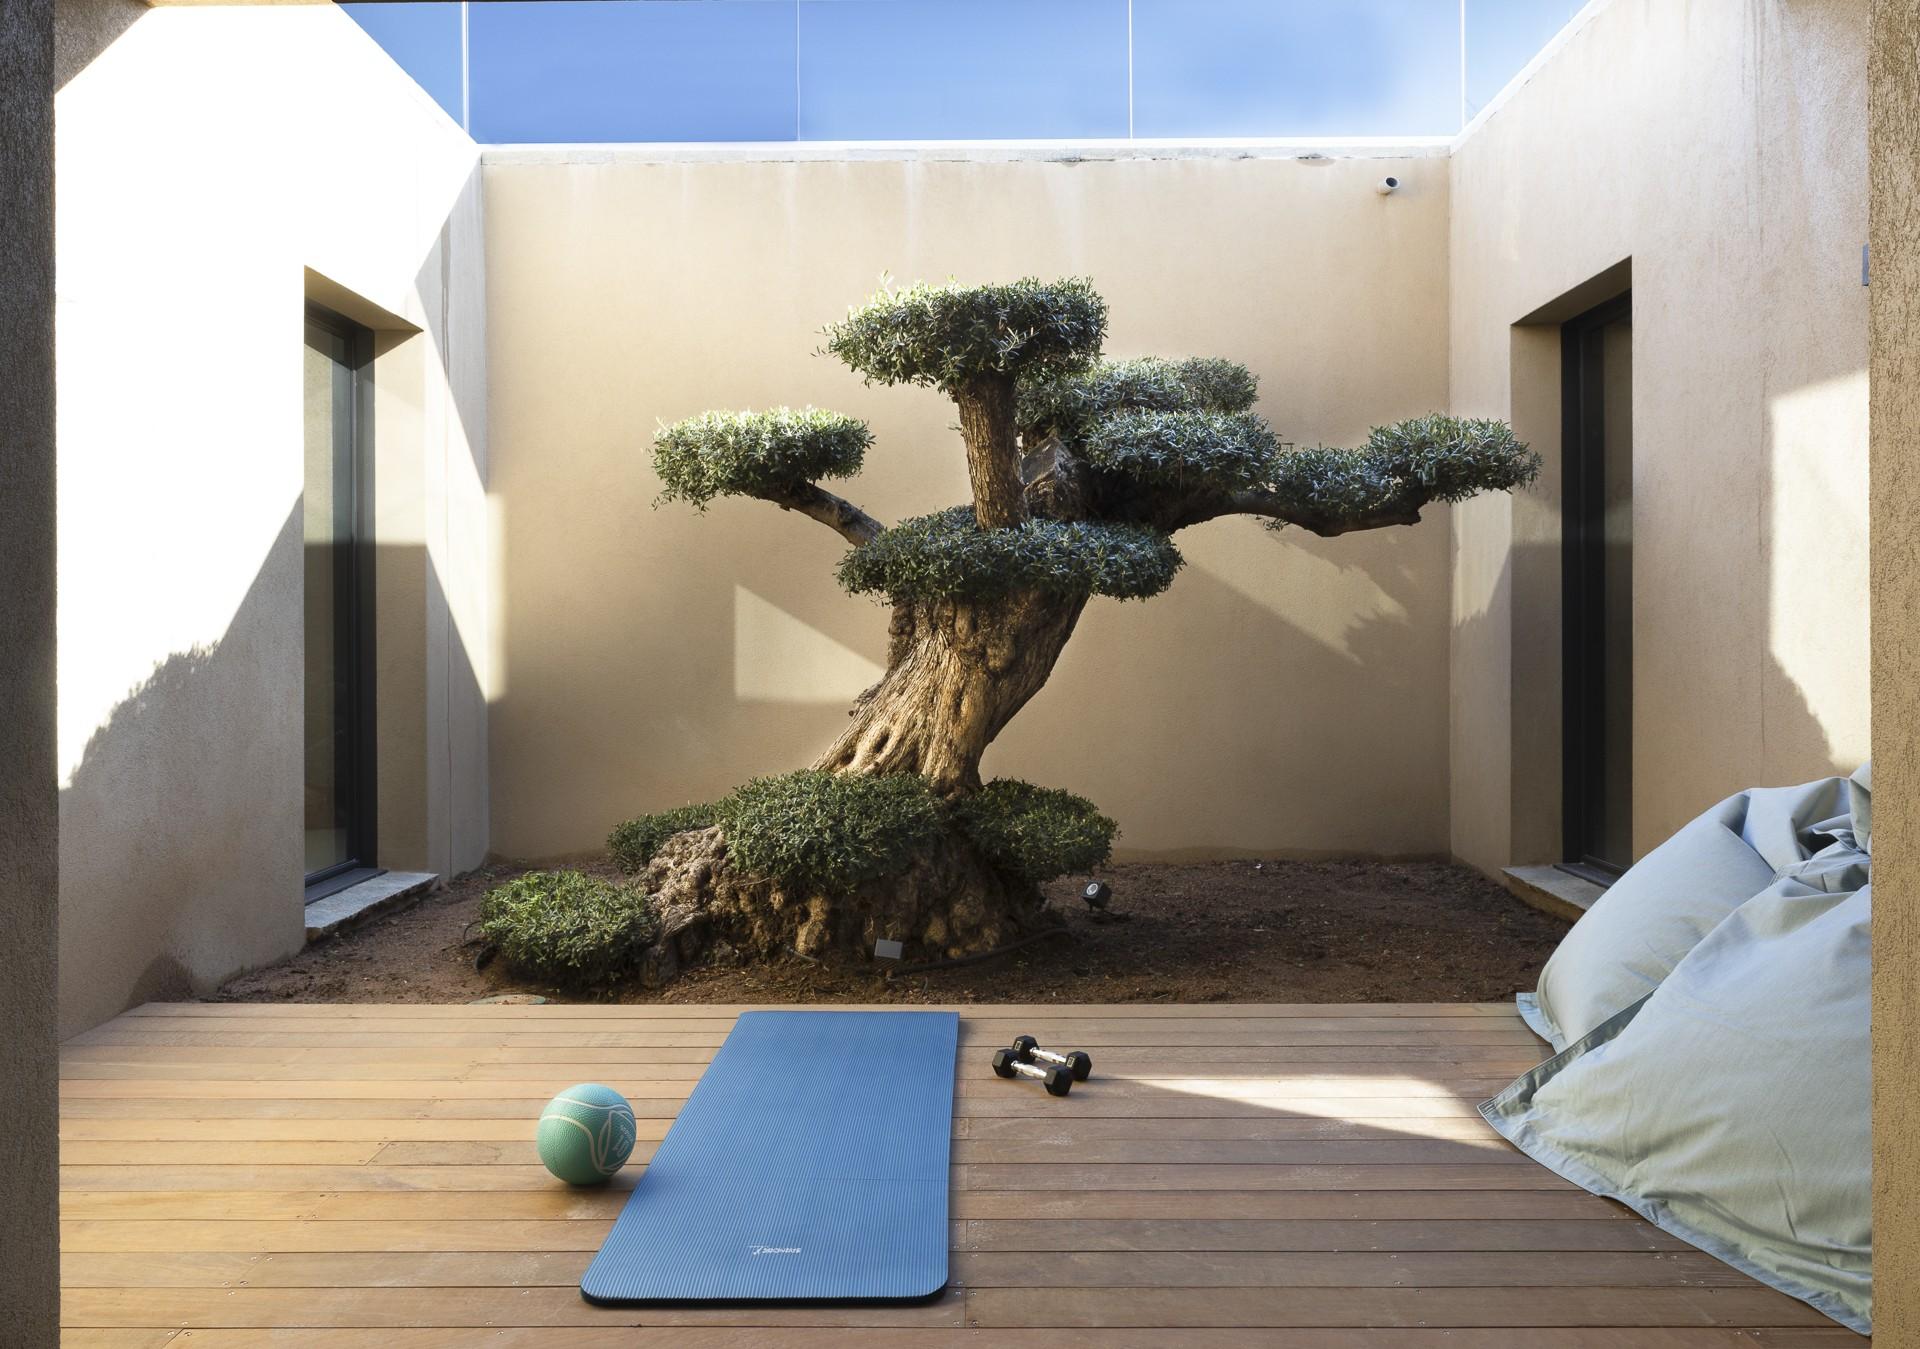 Porto Vecchio Luxury Rental Villa Perle Fitness Room 2